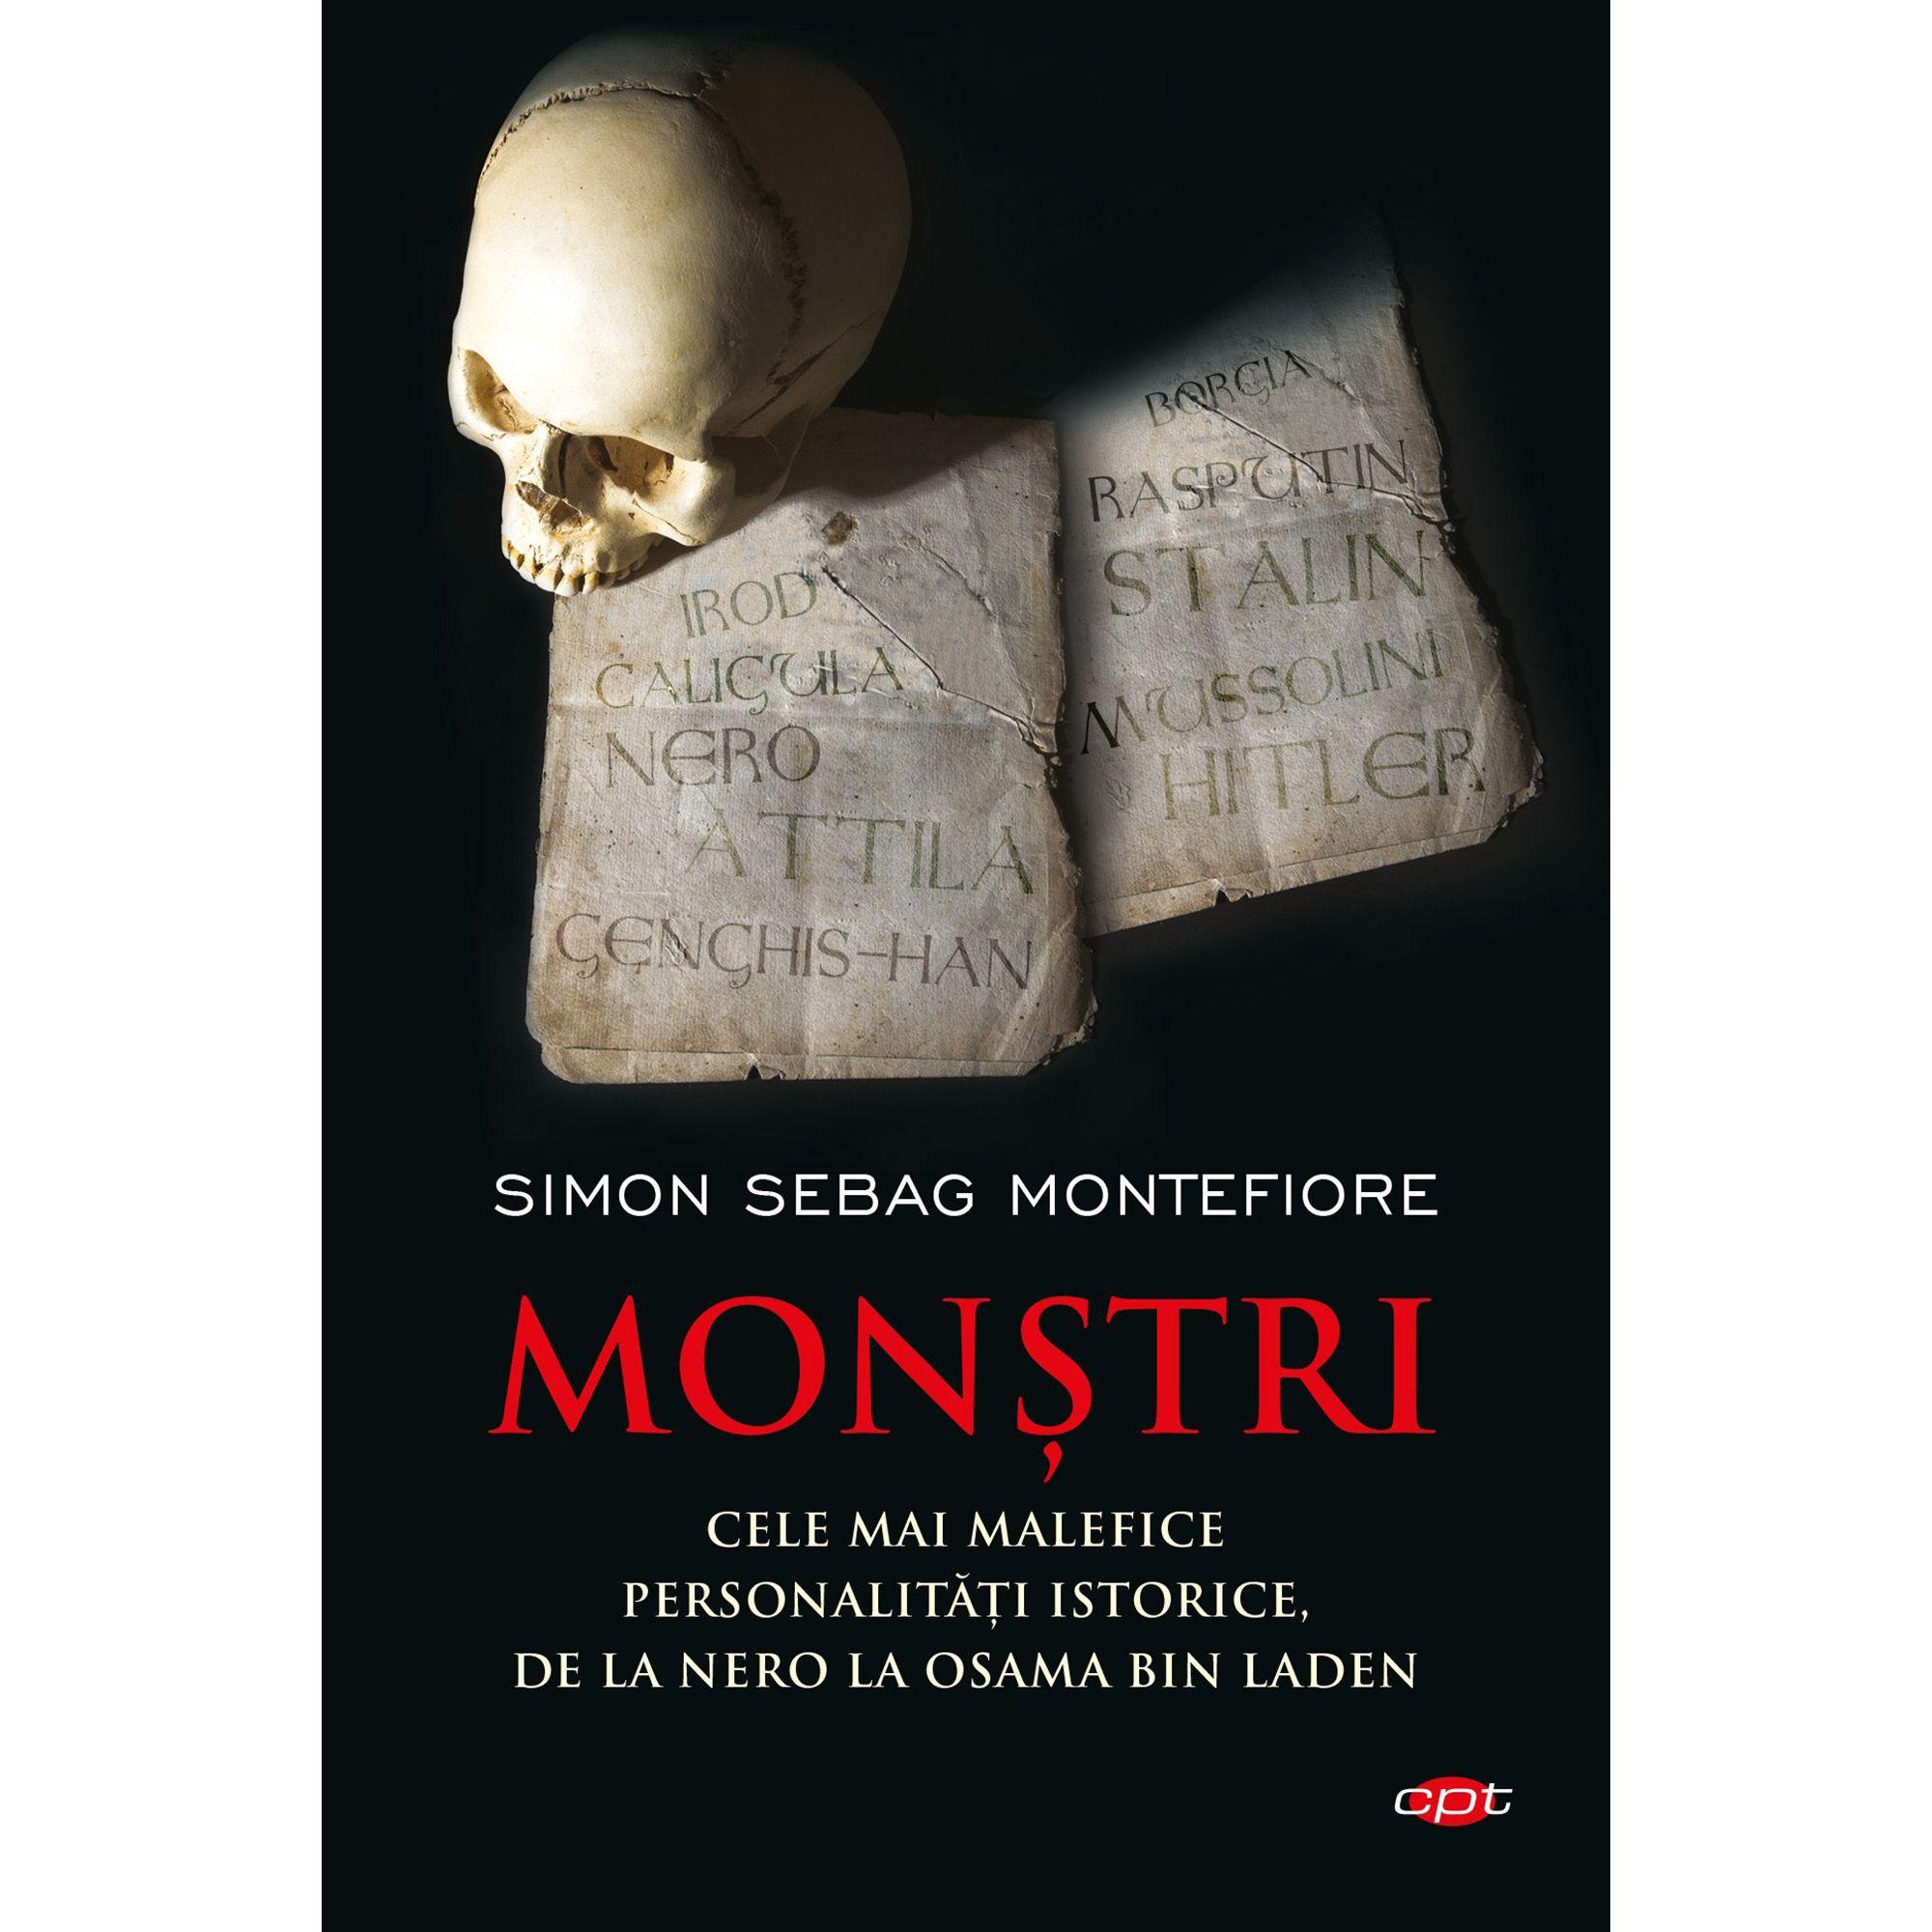 Monstri | Simon Sebag Montefiore